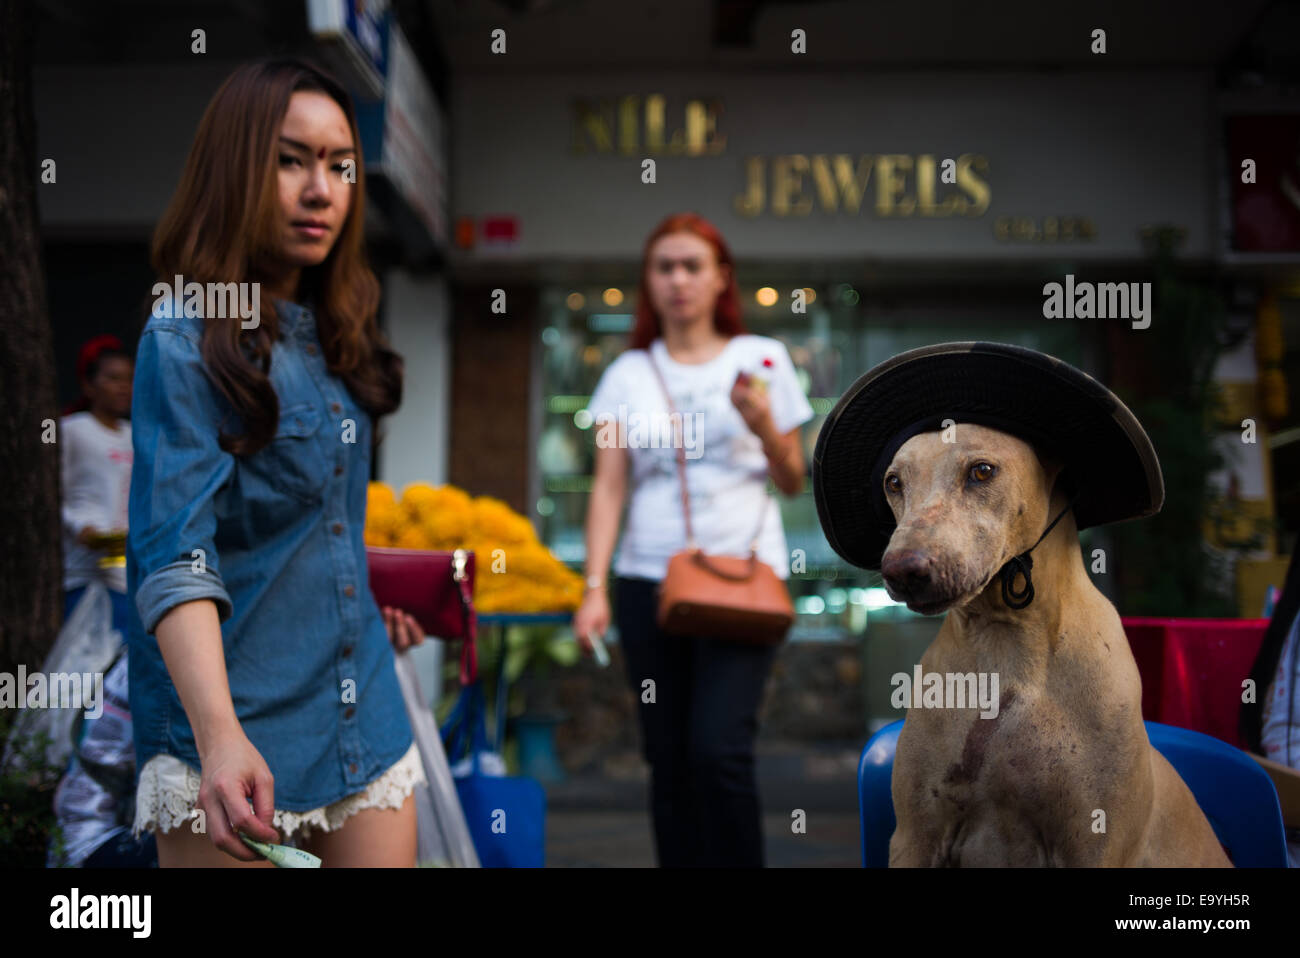 Thai transvestite 'lady-boy' making a donation to old paralyzed dog owner. - Stock Image